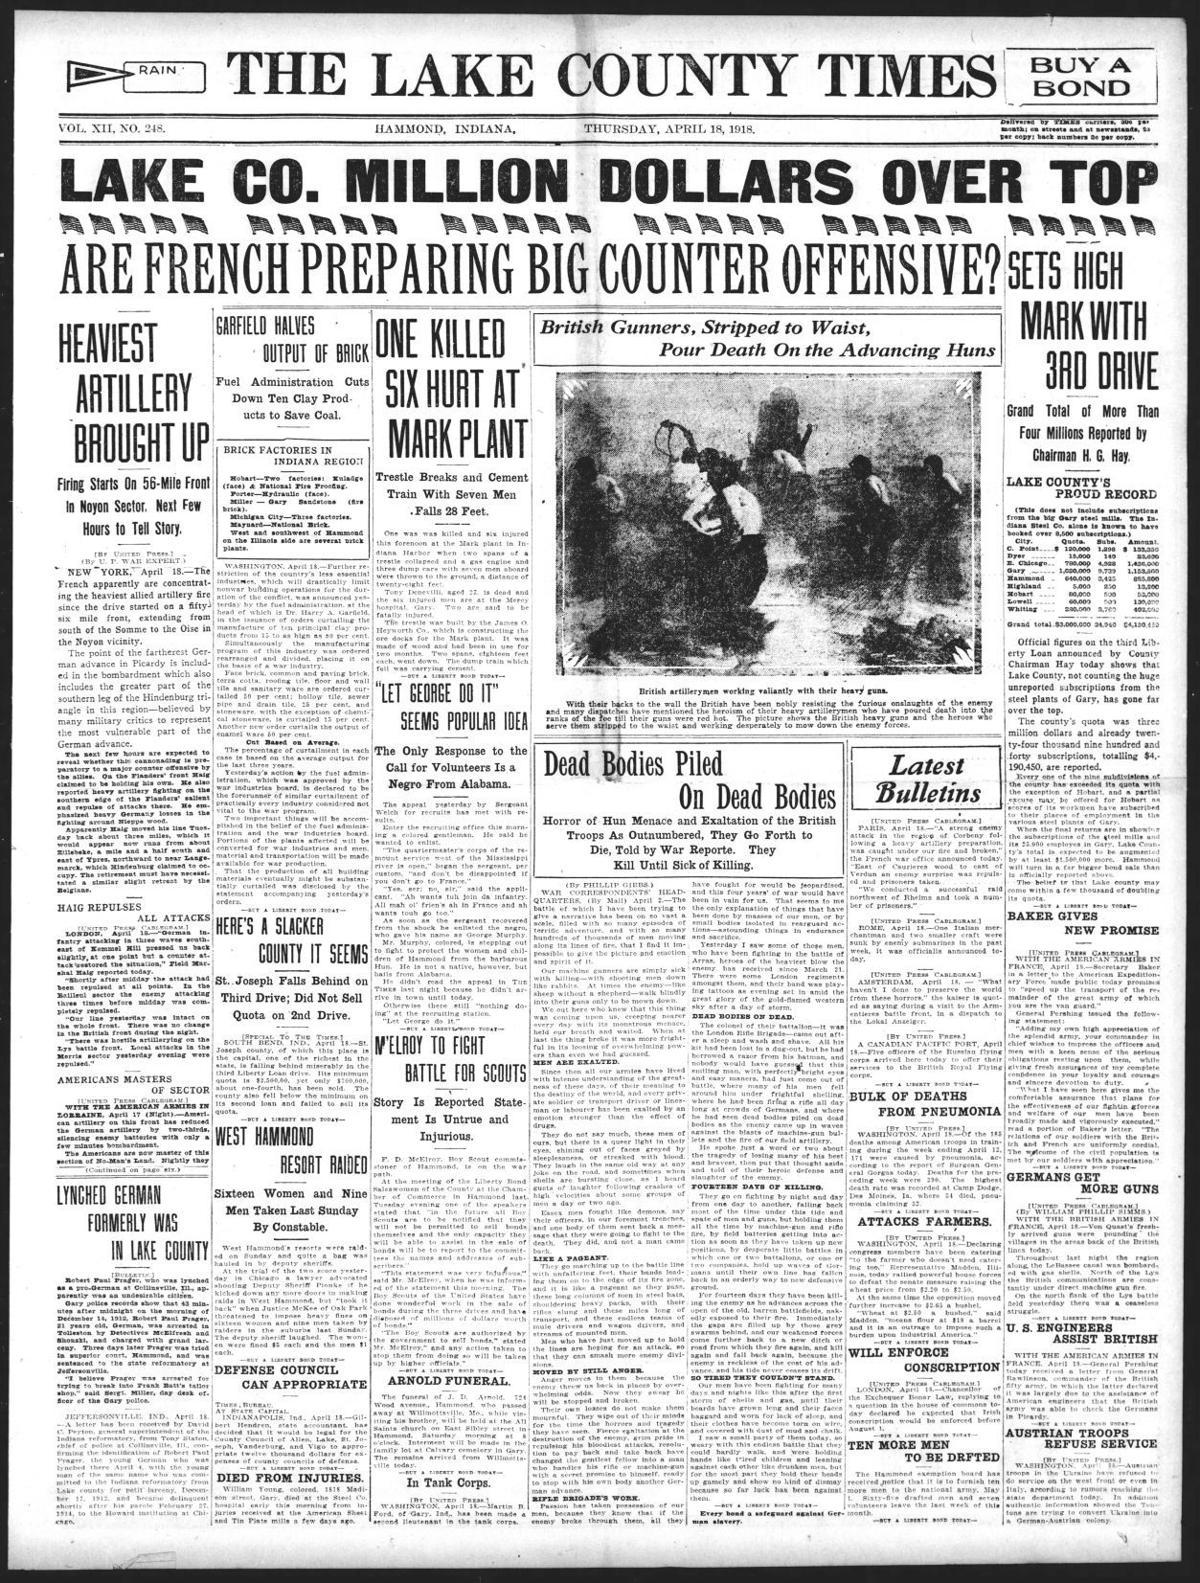 April 18, 1918: One Killed Six Hurt at Mark Plant